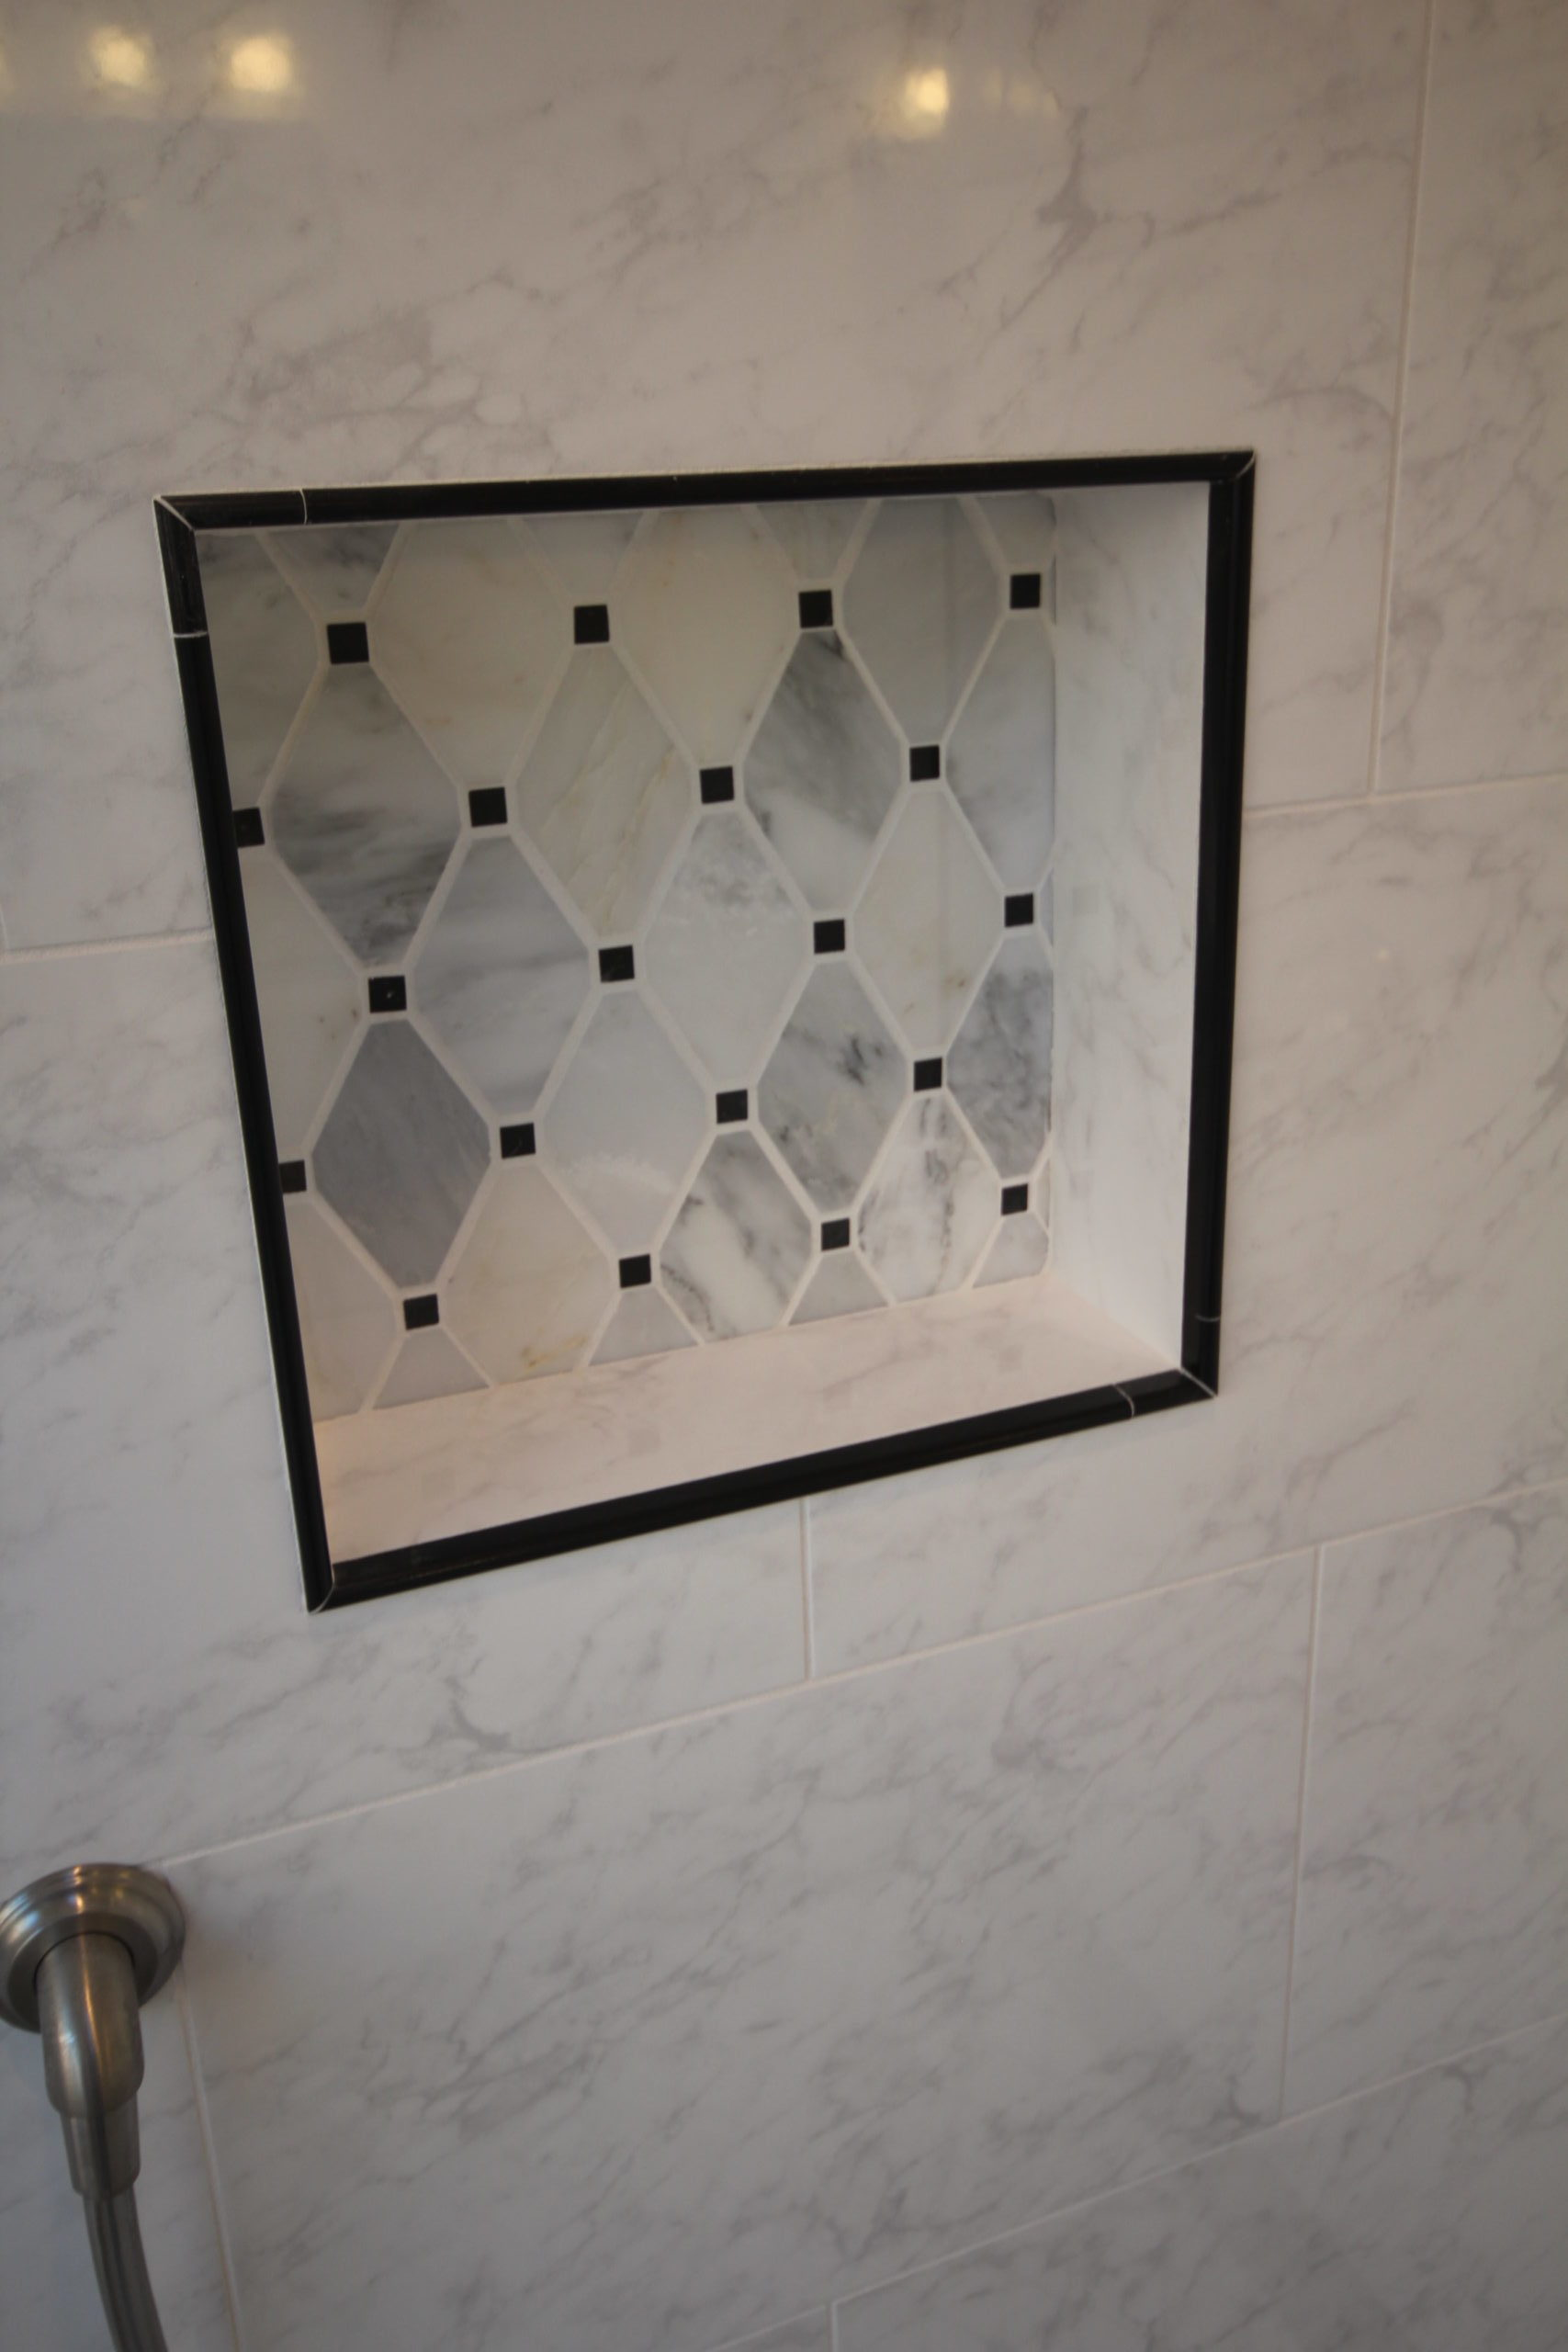 bathroom-remodeling-work-TAG-Builders-209-GV-Bathroom-Remodel-5-scaled-e1586518819132